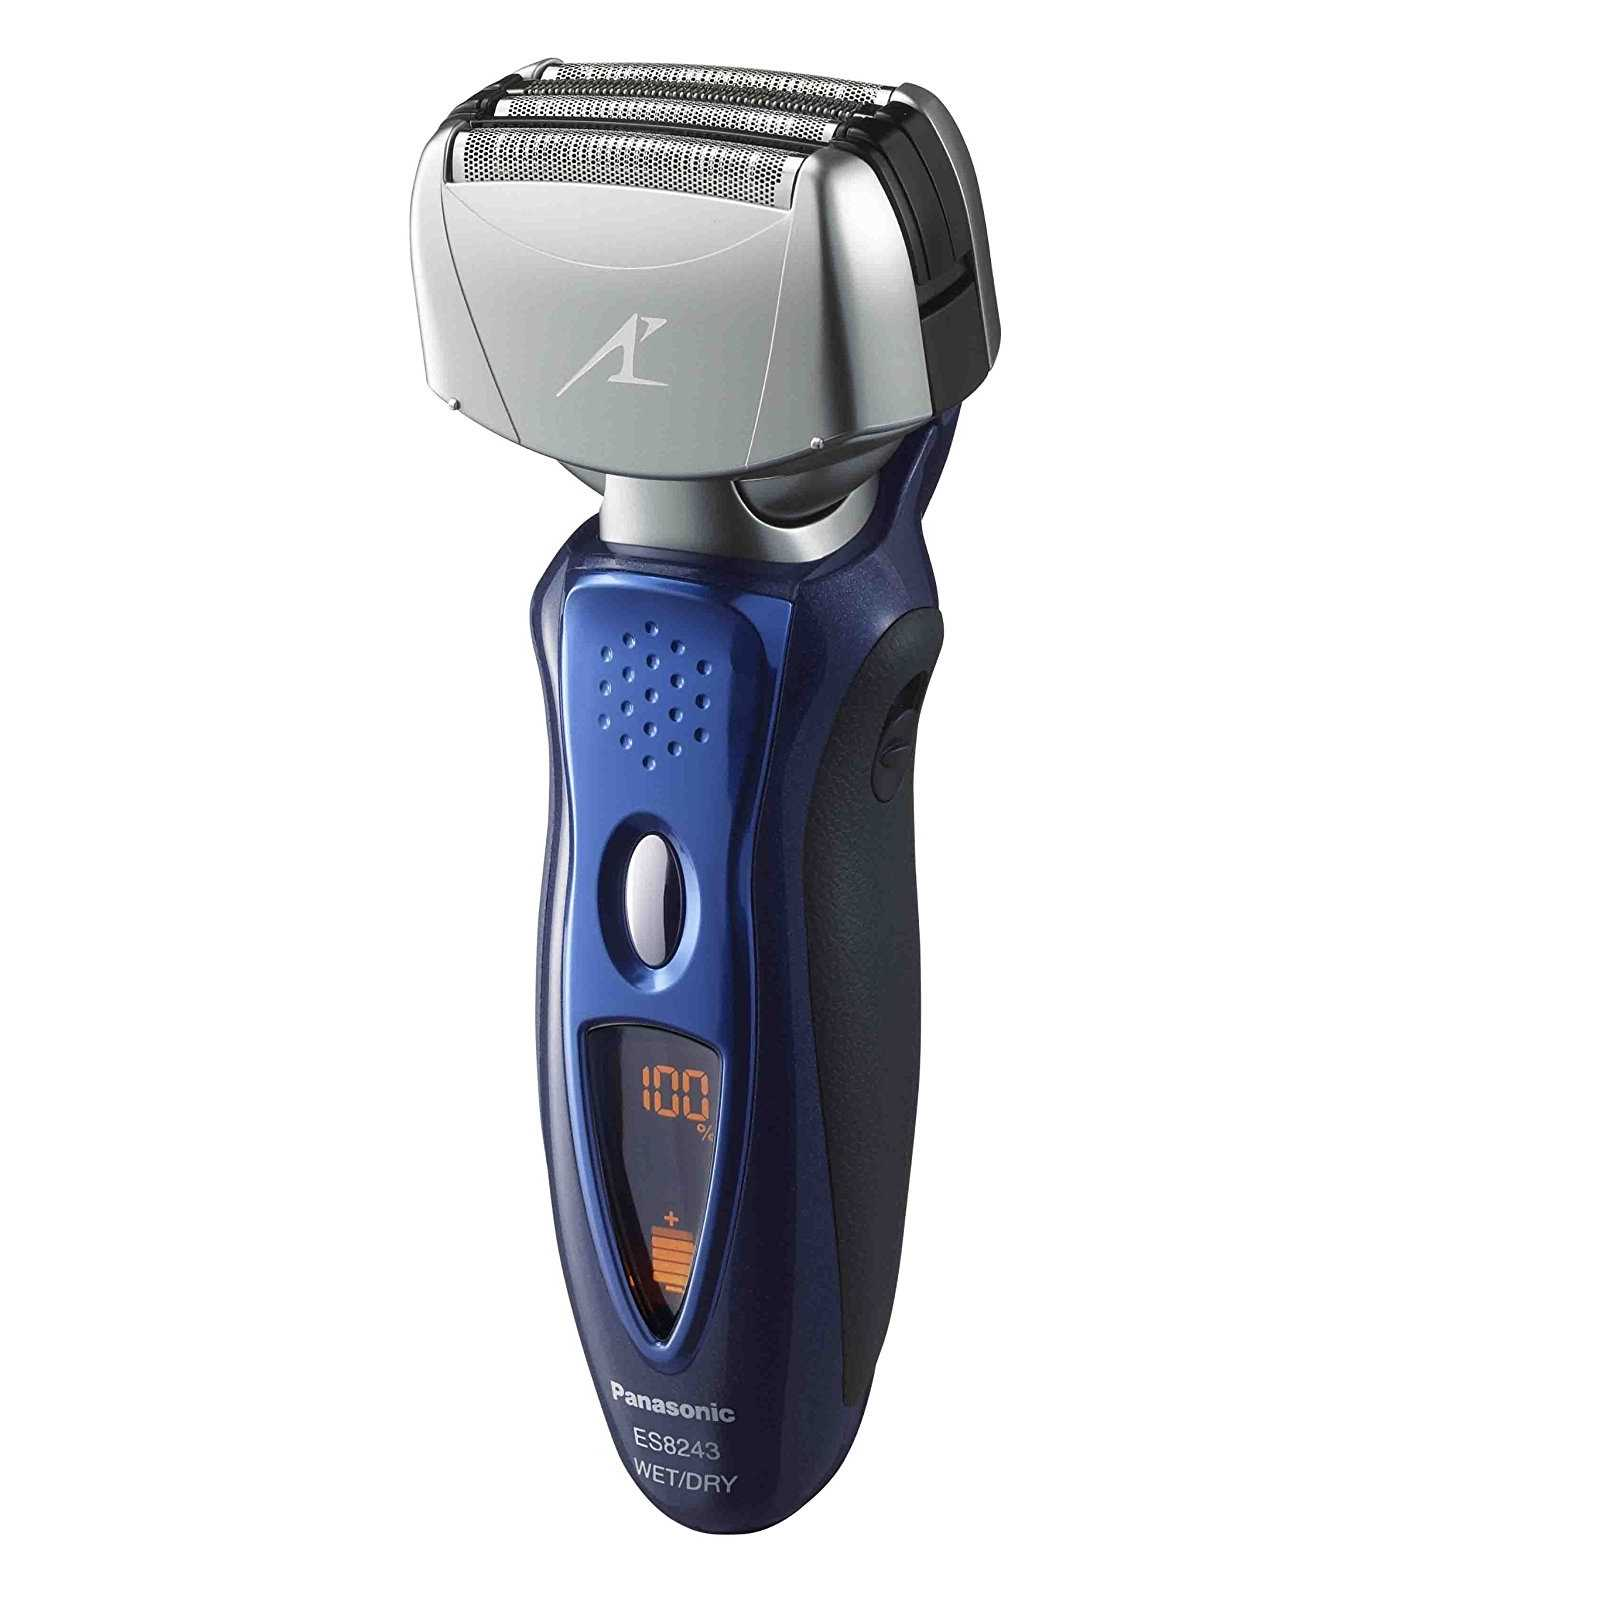 Panasonic ES8243A Electric Shaver